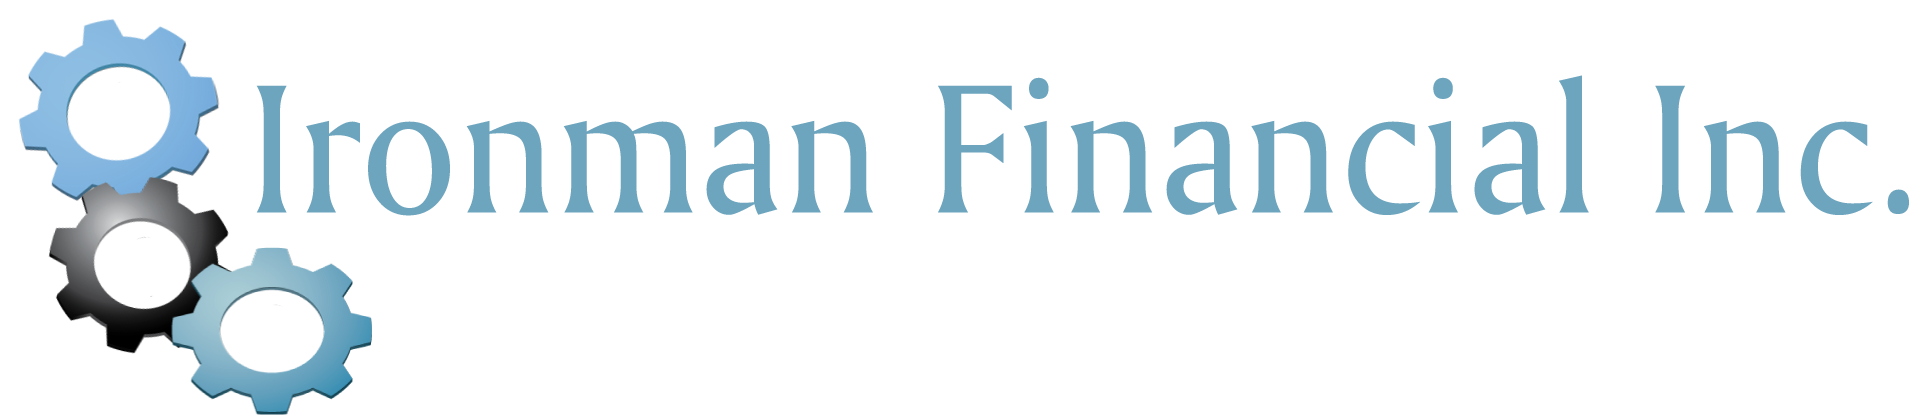 Ironman Finanacial